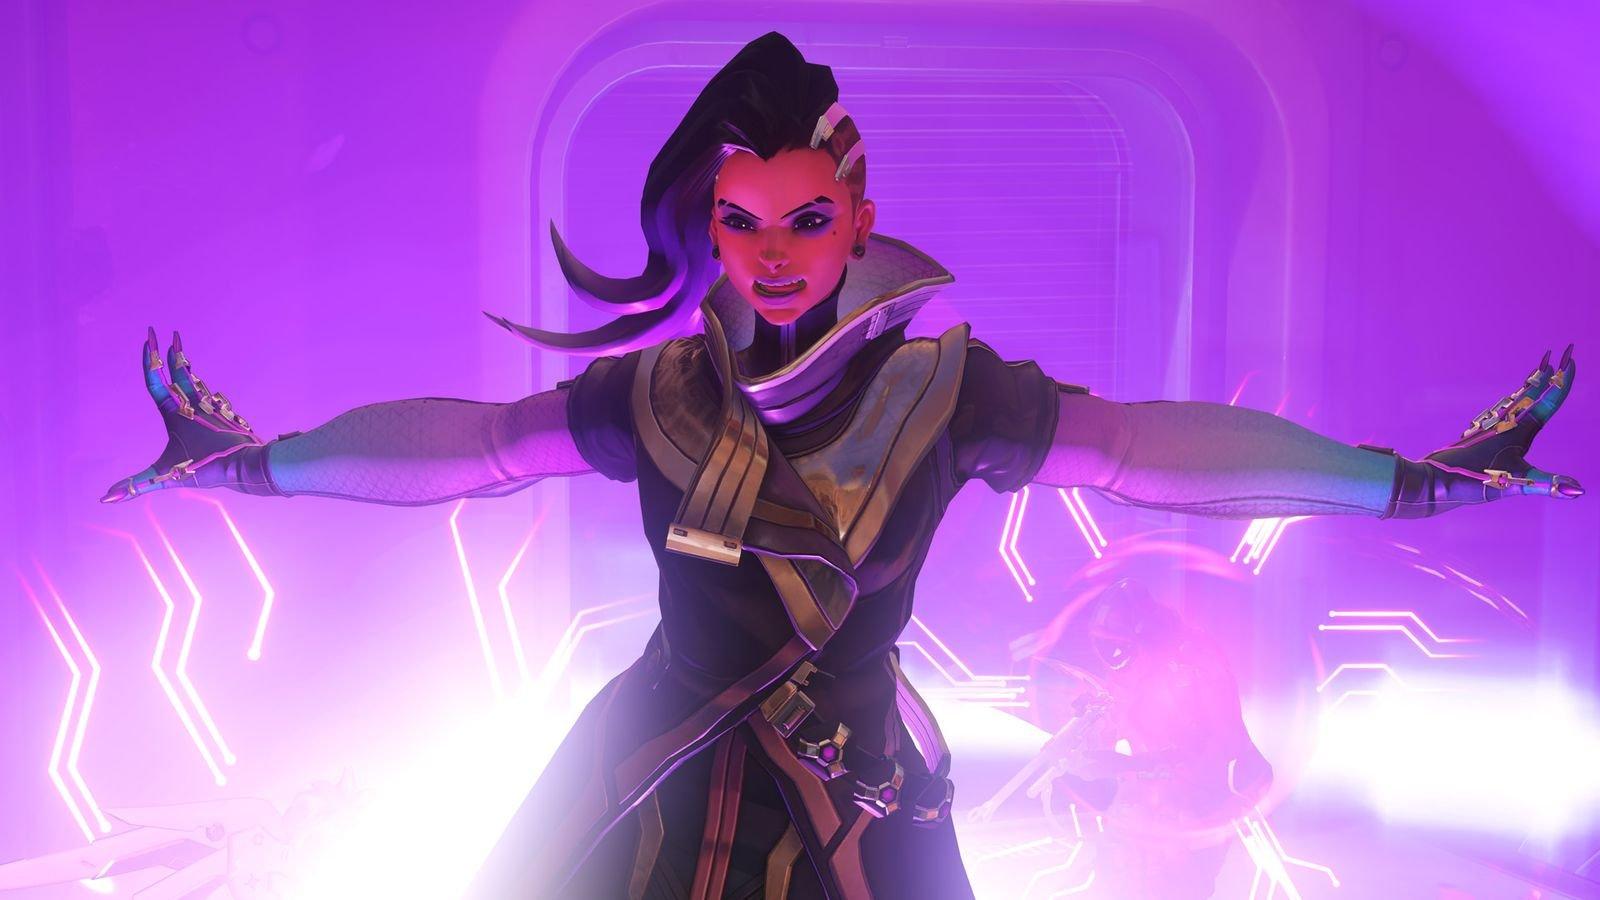 BlizzCon 2016: Overwatch's Sombra Unveiled 1